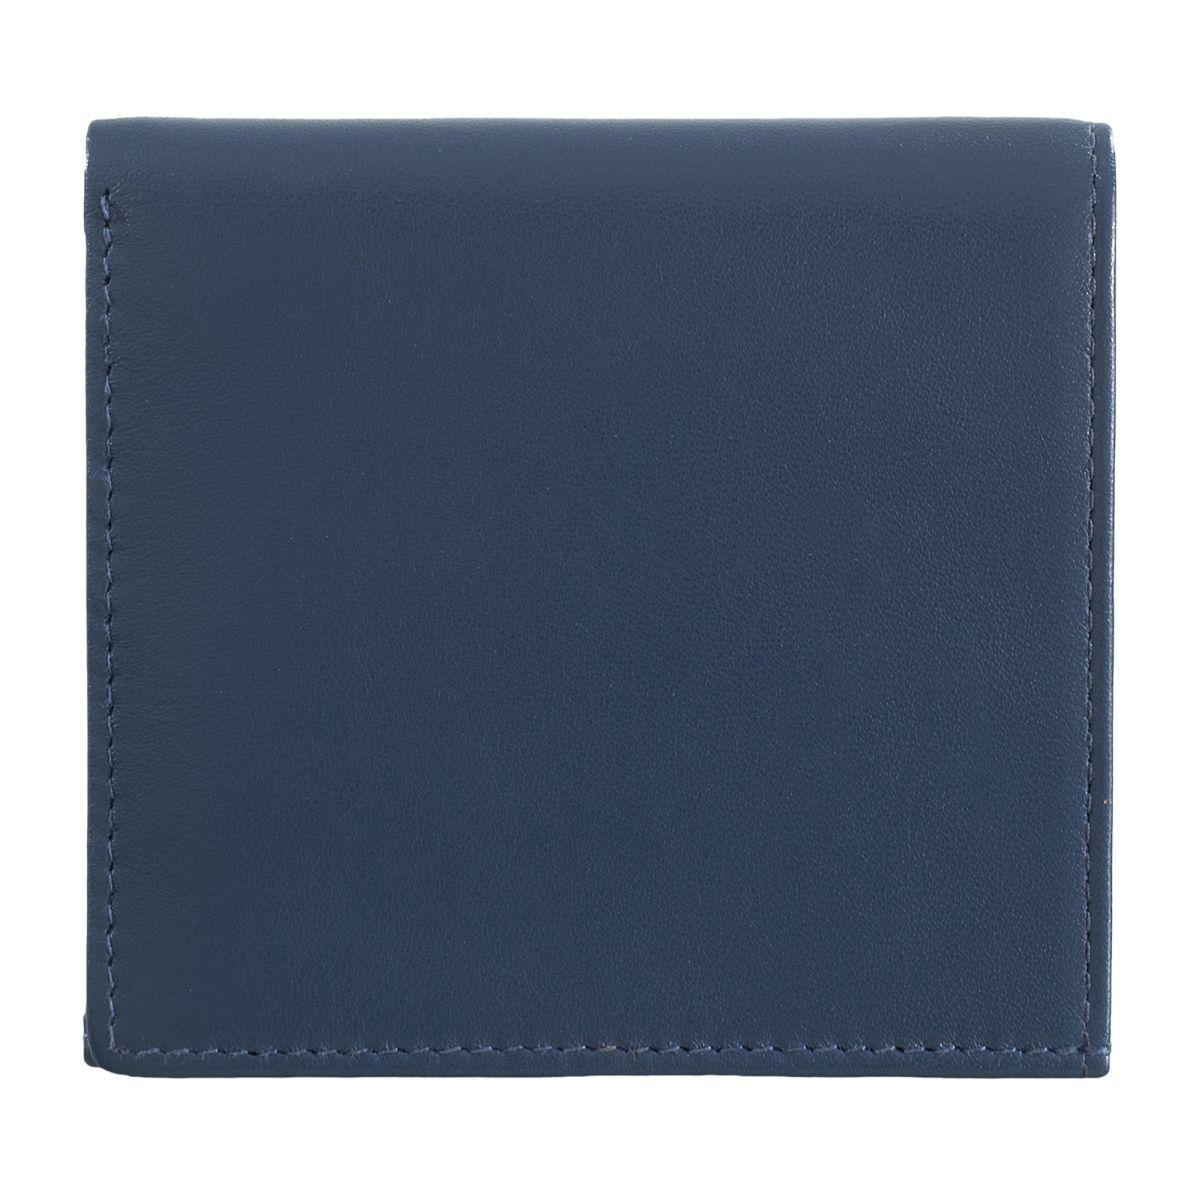 DuDu ארנק עור צבעוני עם תא ייחודי למטבעות - כחול כהה